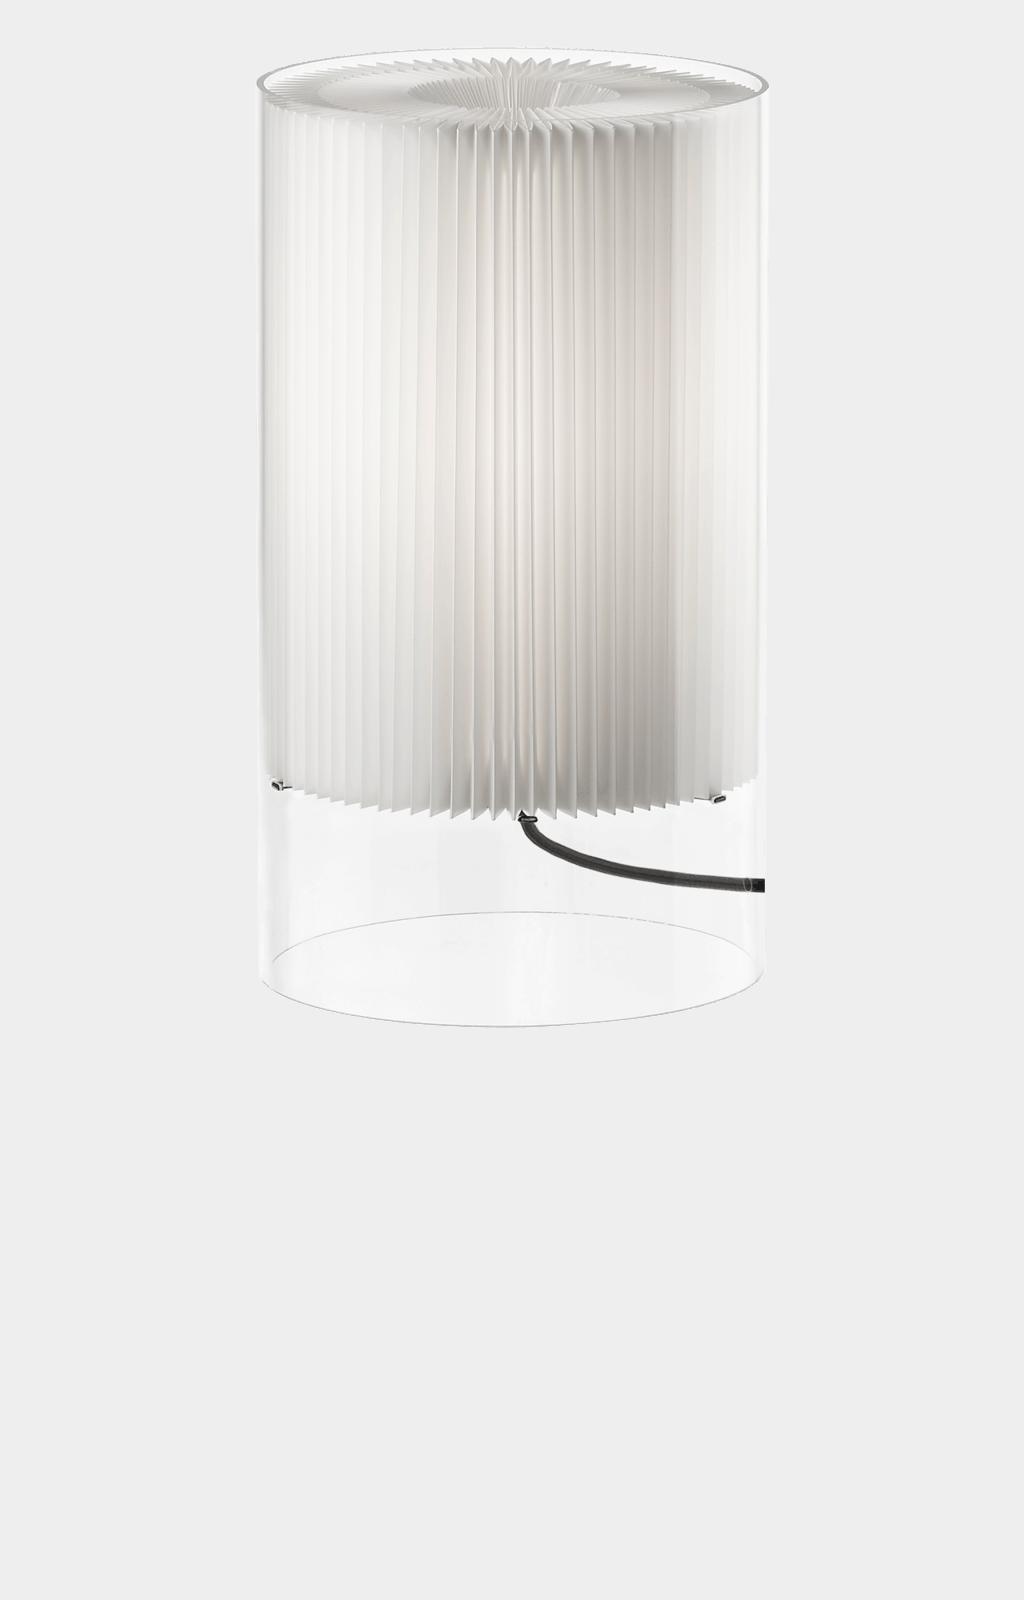 Lampa podłogowa Model 312 - 21 -M